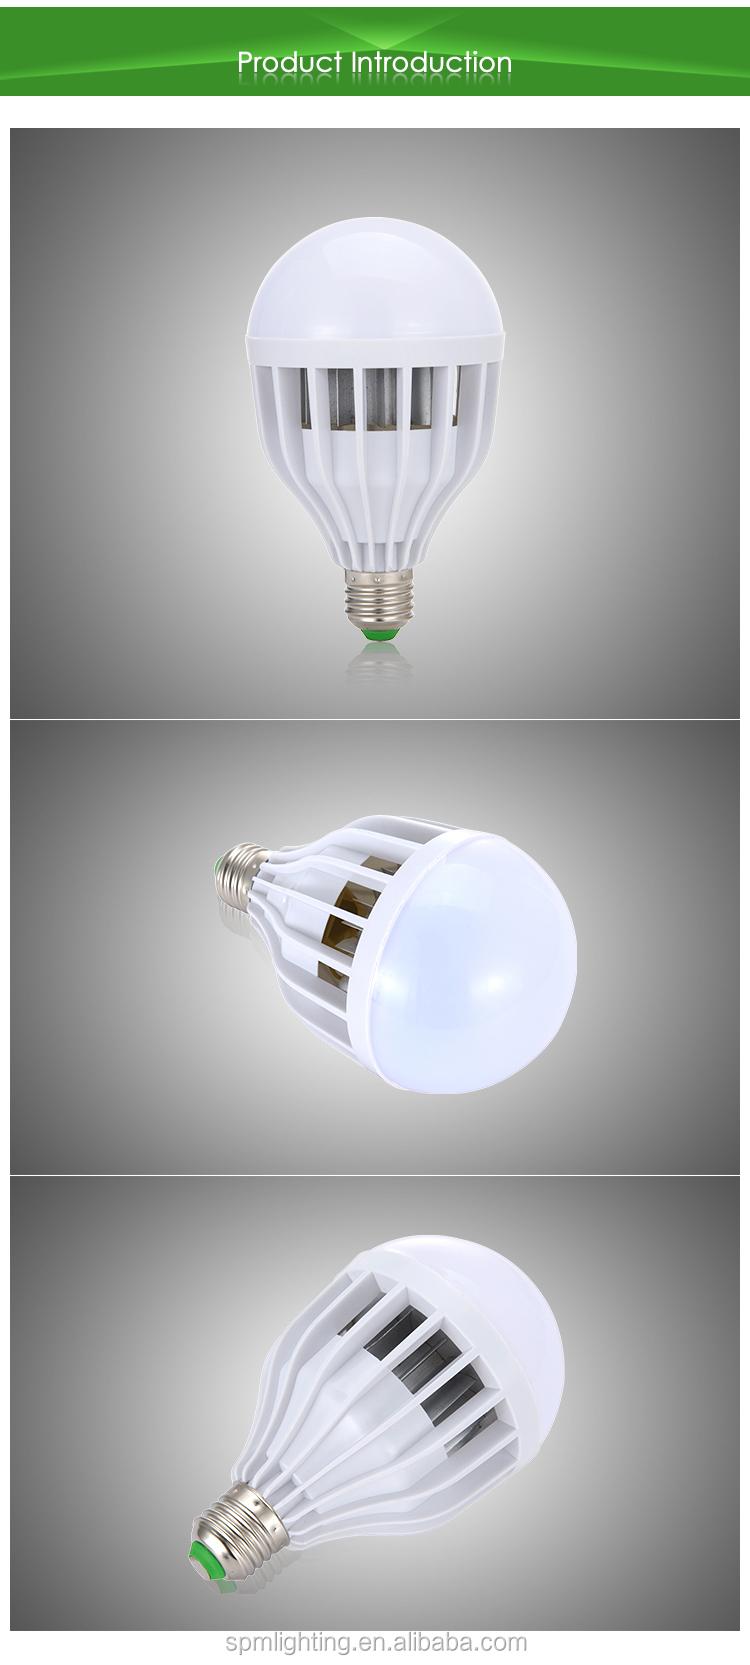 Cost Effective Led Bulb Circuit Board Livarno Lux Buy E27 Lamps